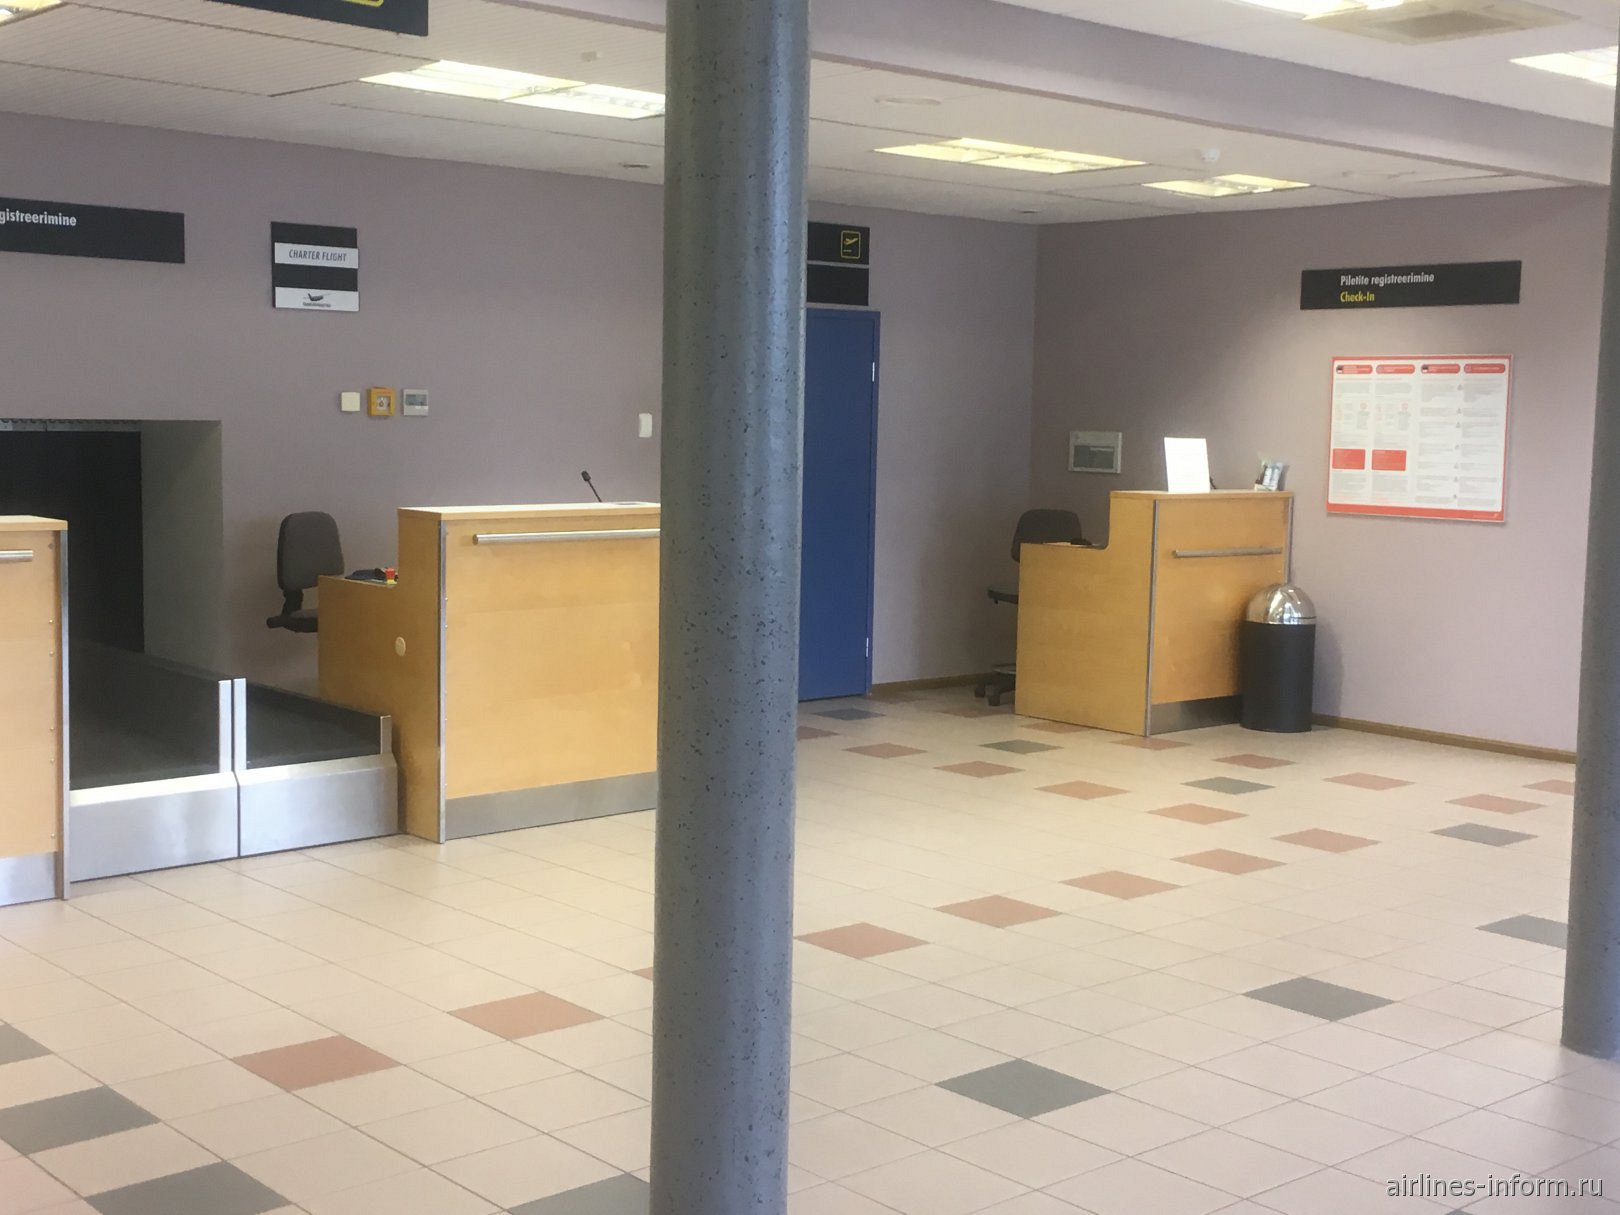 Стойки регистрации в аэропорту Курессааре